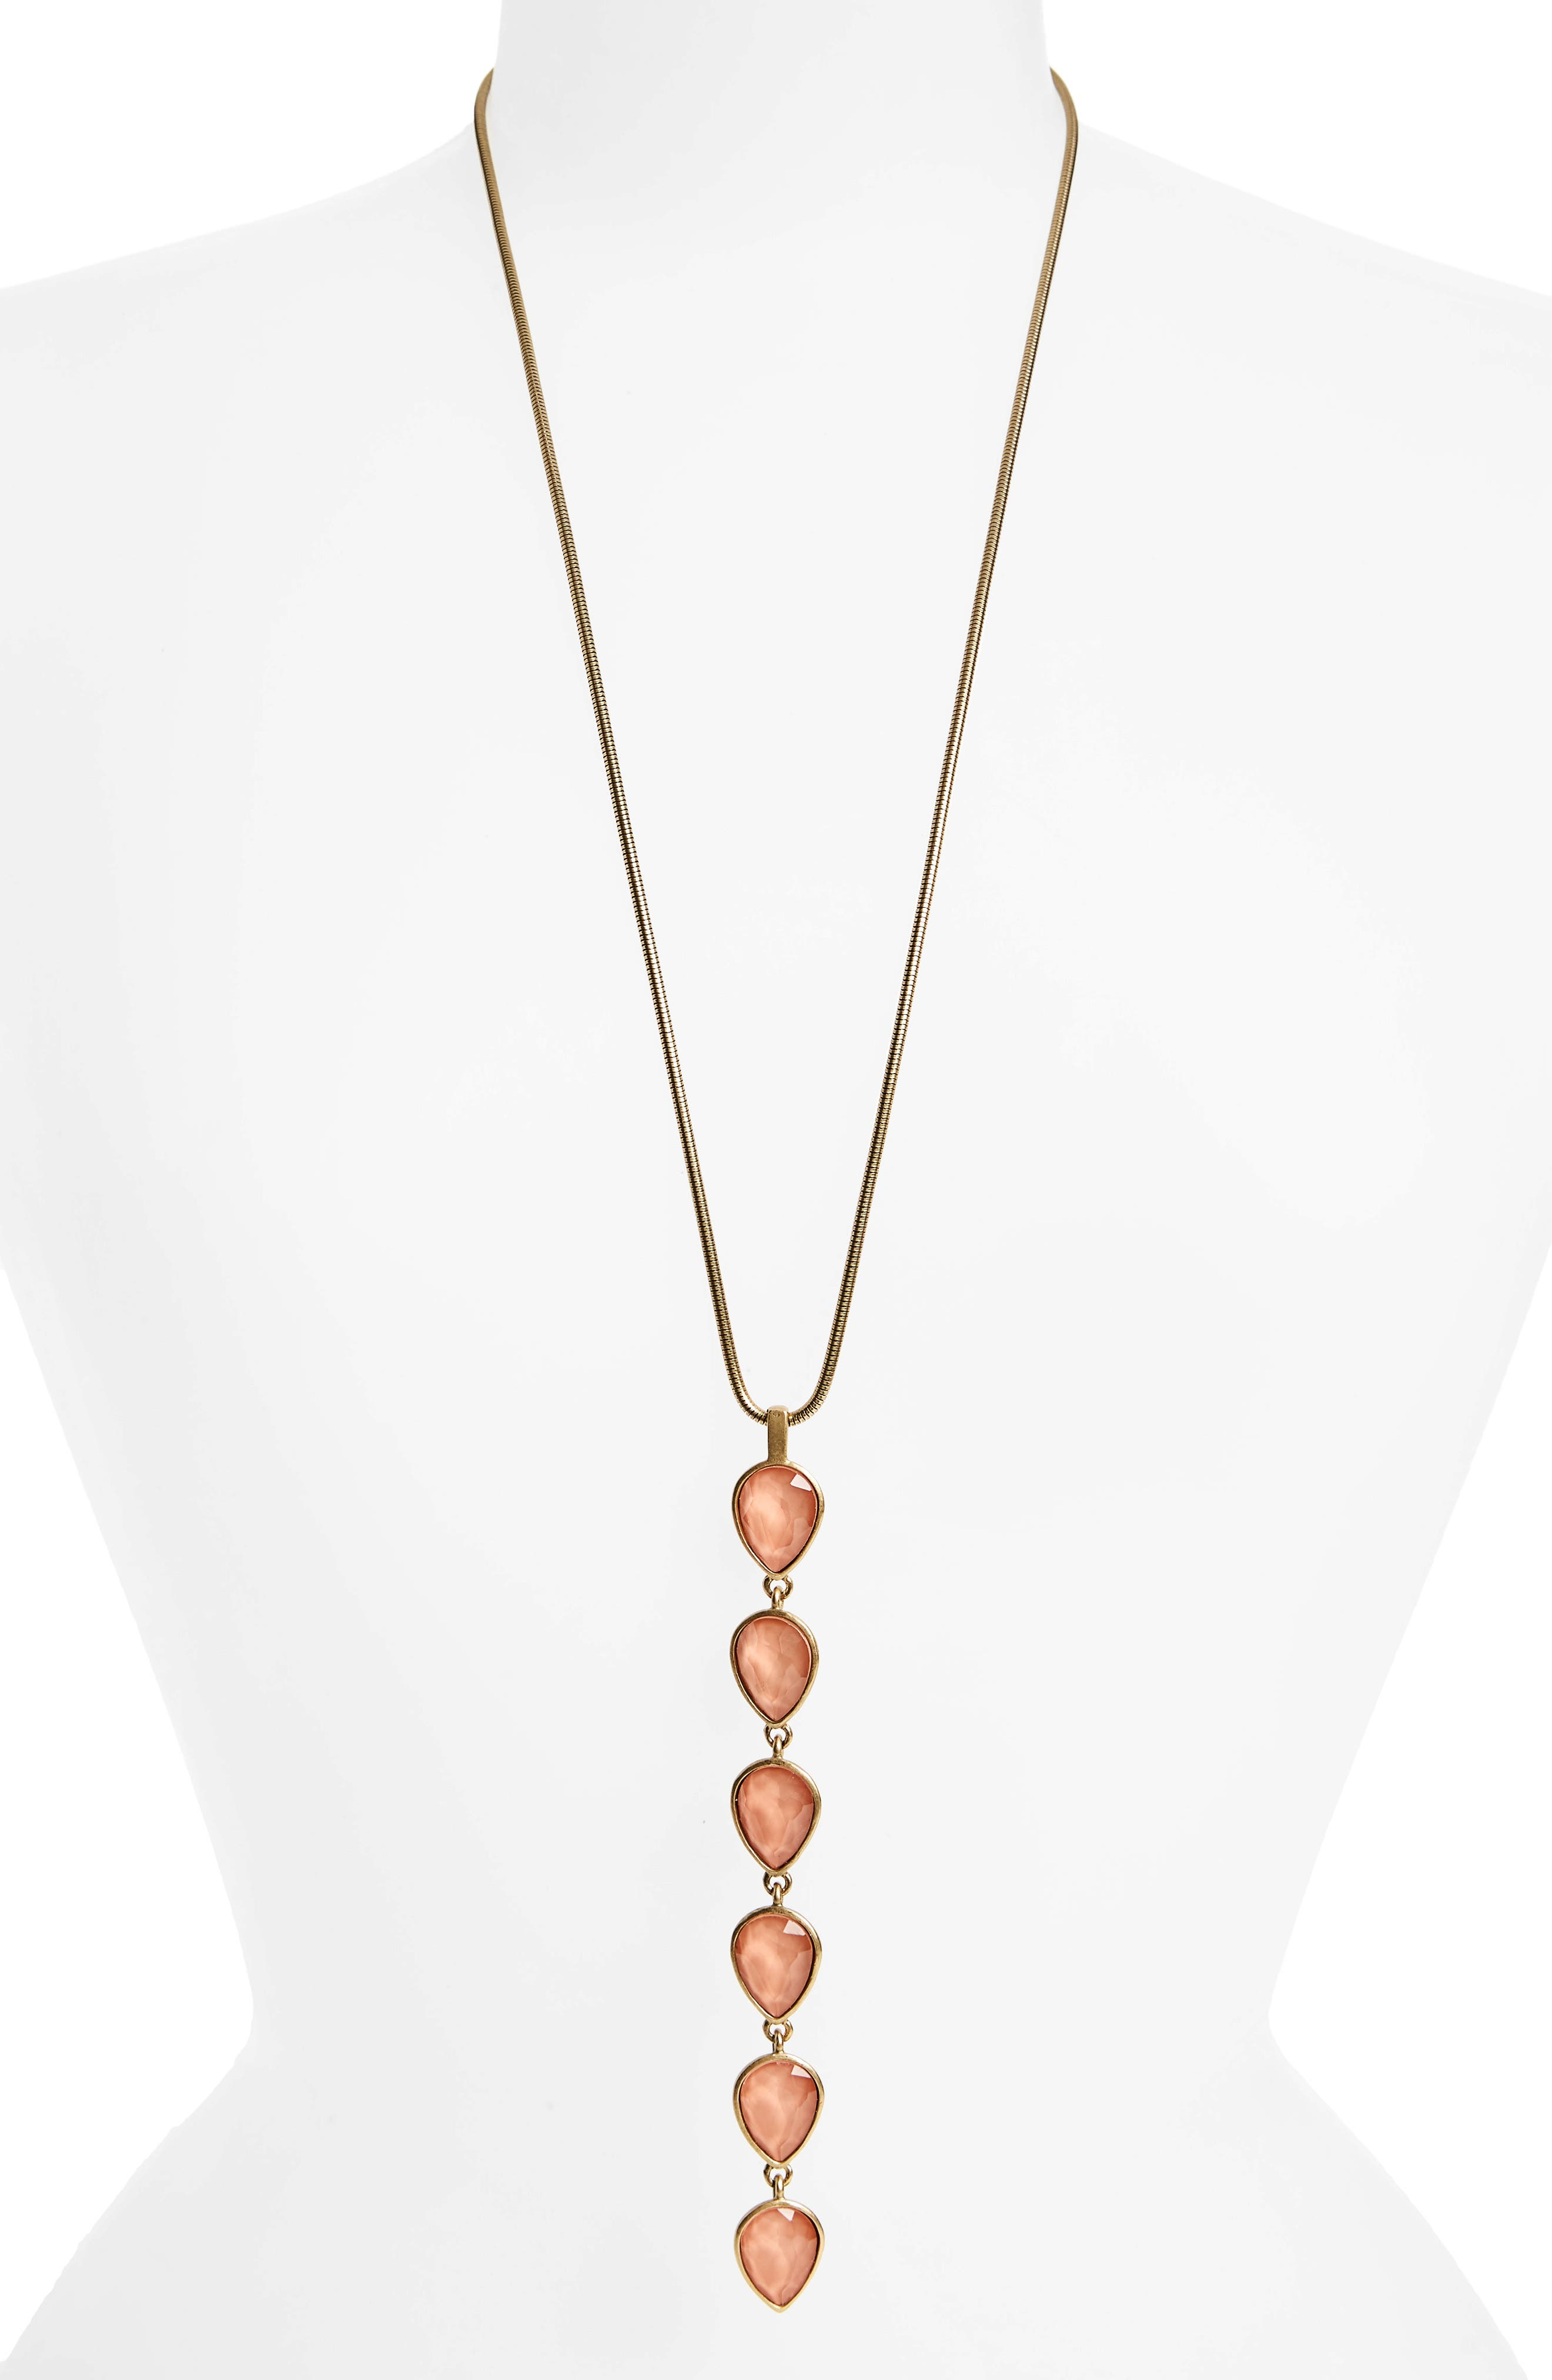 Main Image - Loren Hope Sydney Pendant Necklace